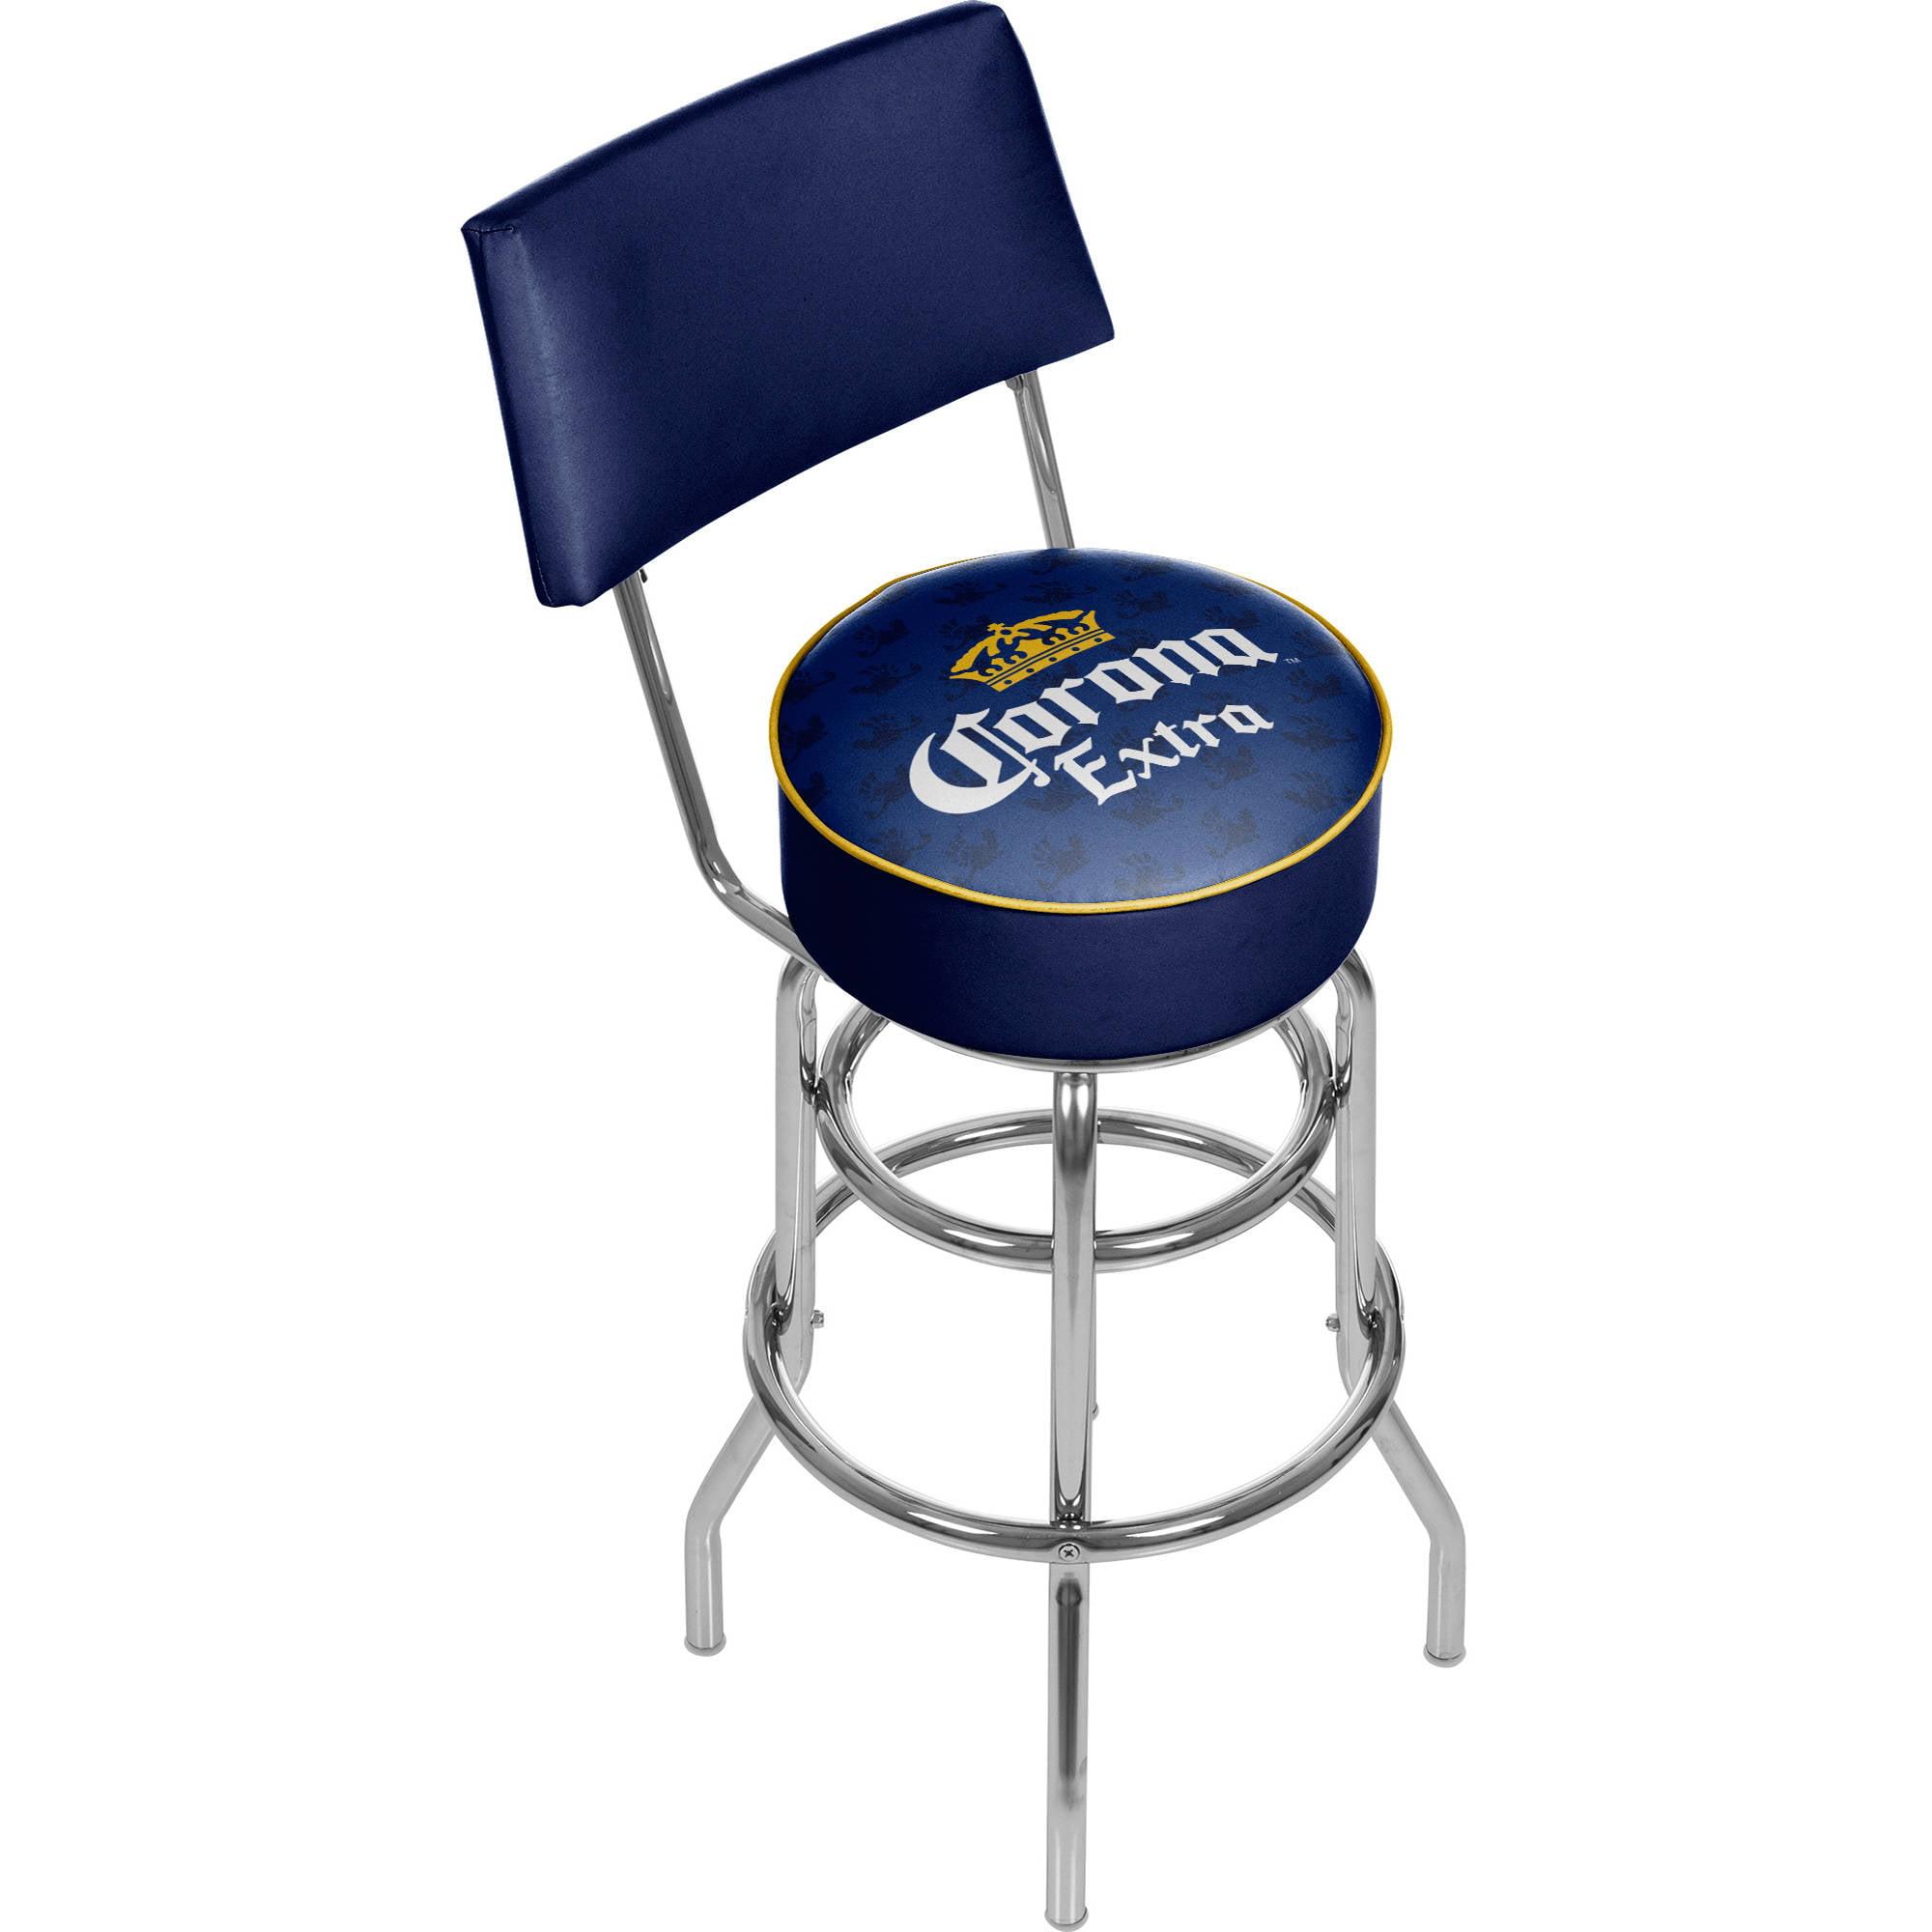 Corona Swivel Bar Stool with Back, Griffin